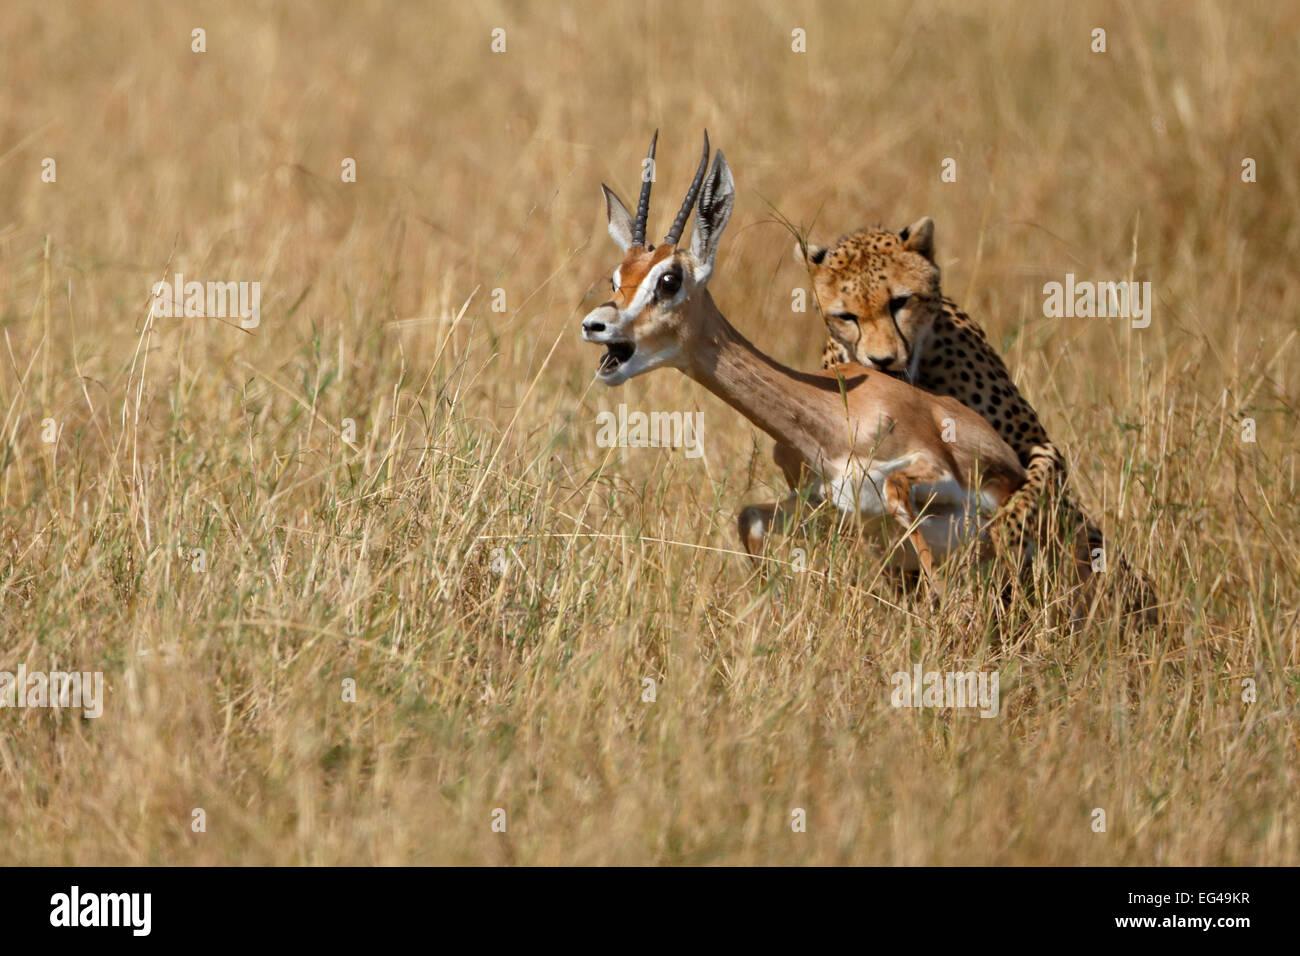 Ghepardo (Acinonyx jubatus) cattura gazelle il Masai Mara Kenya Africa Immagini Stock